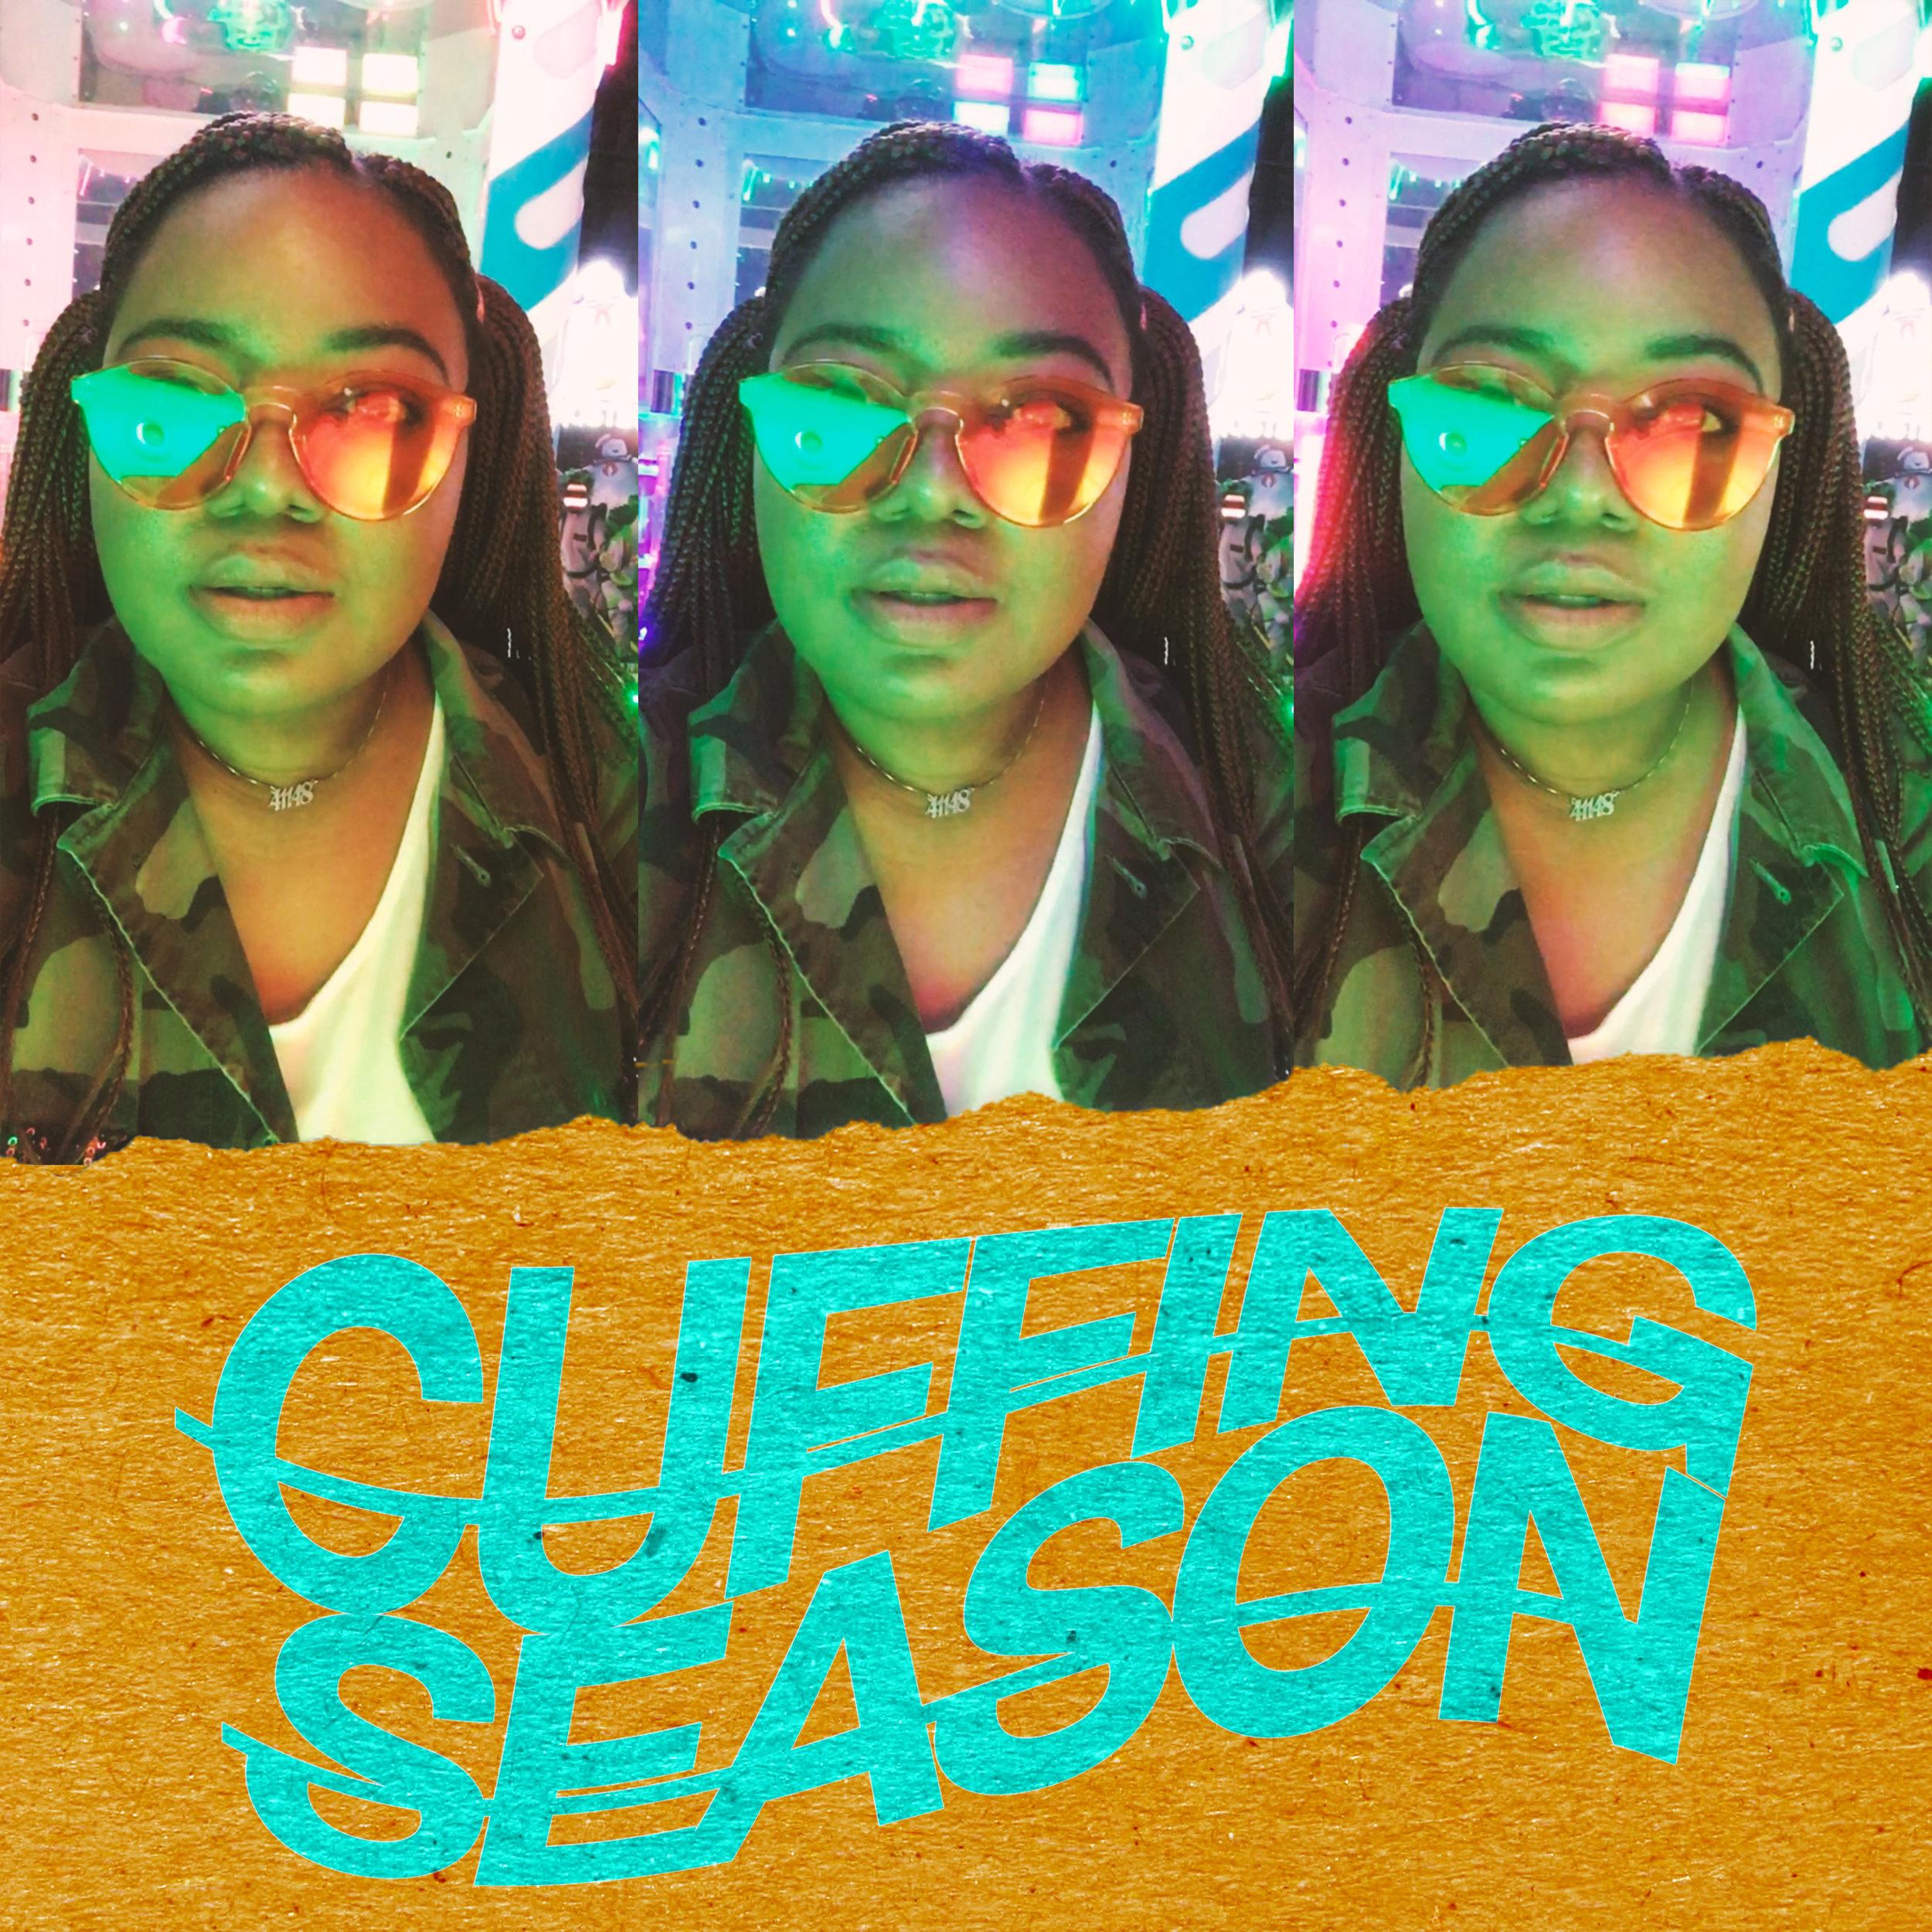 CuffingSeasonCover18.jpg